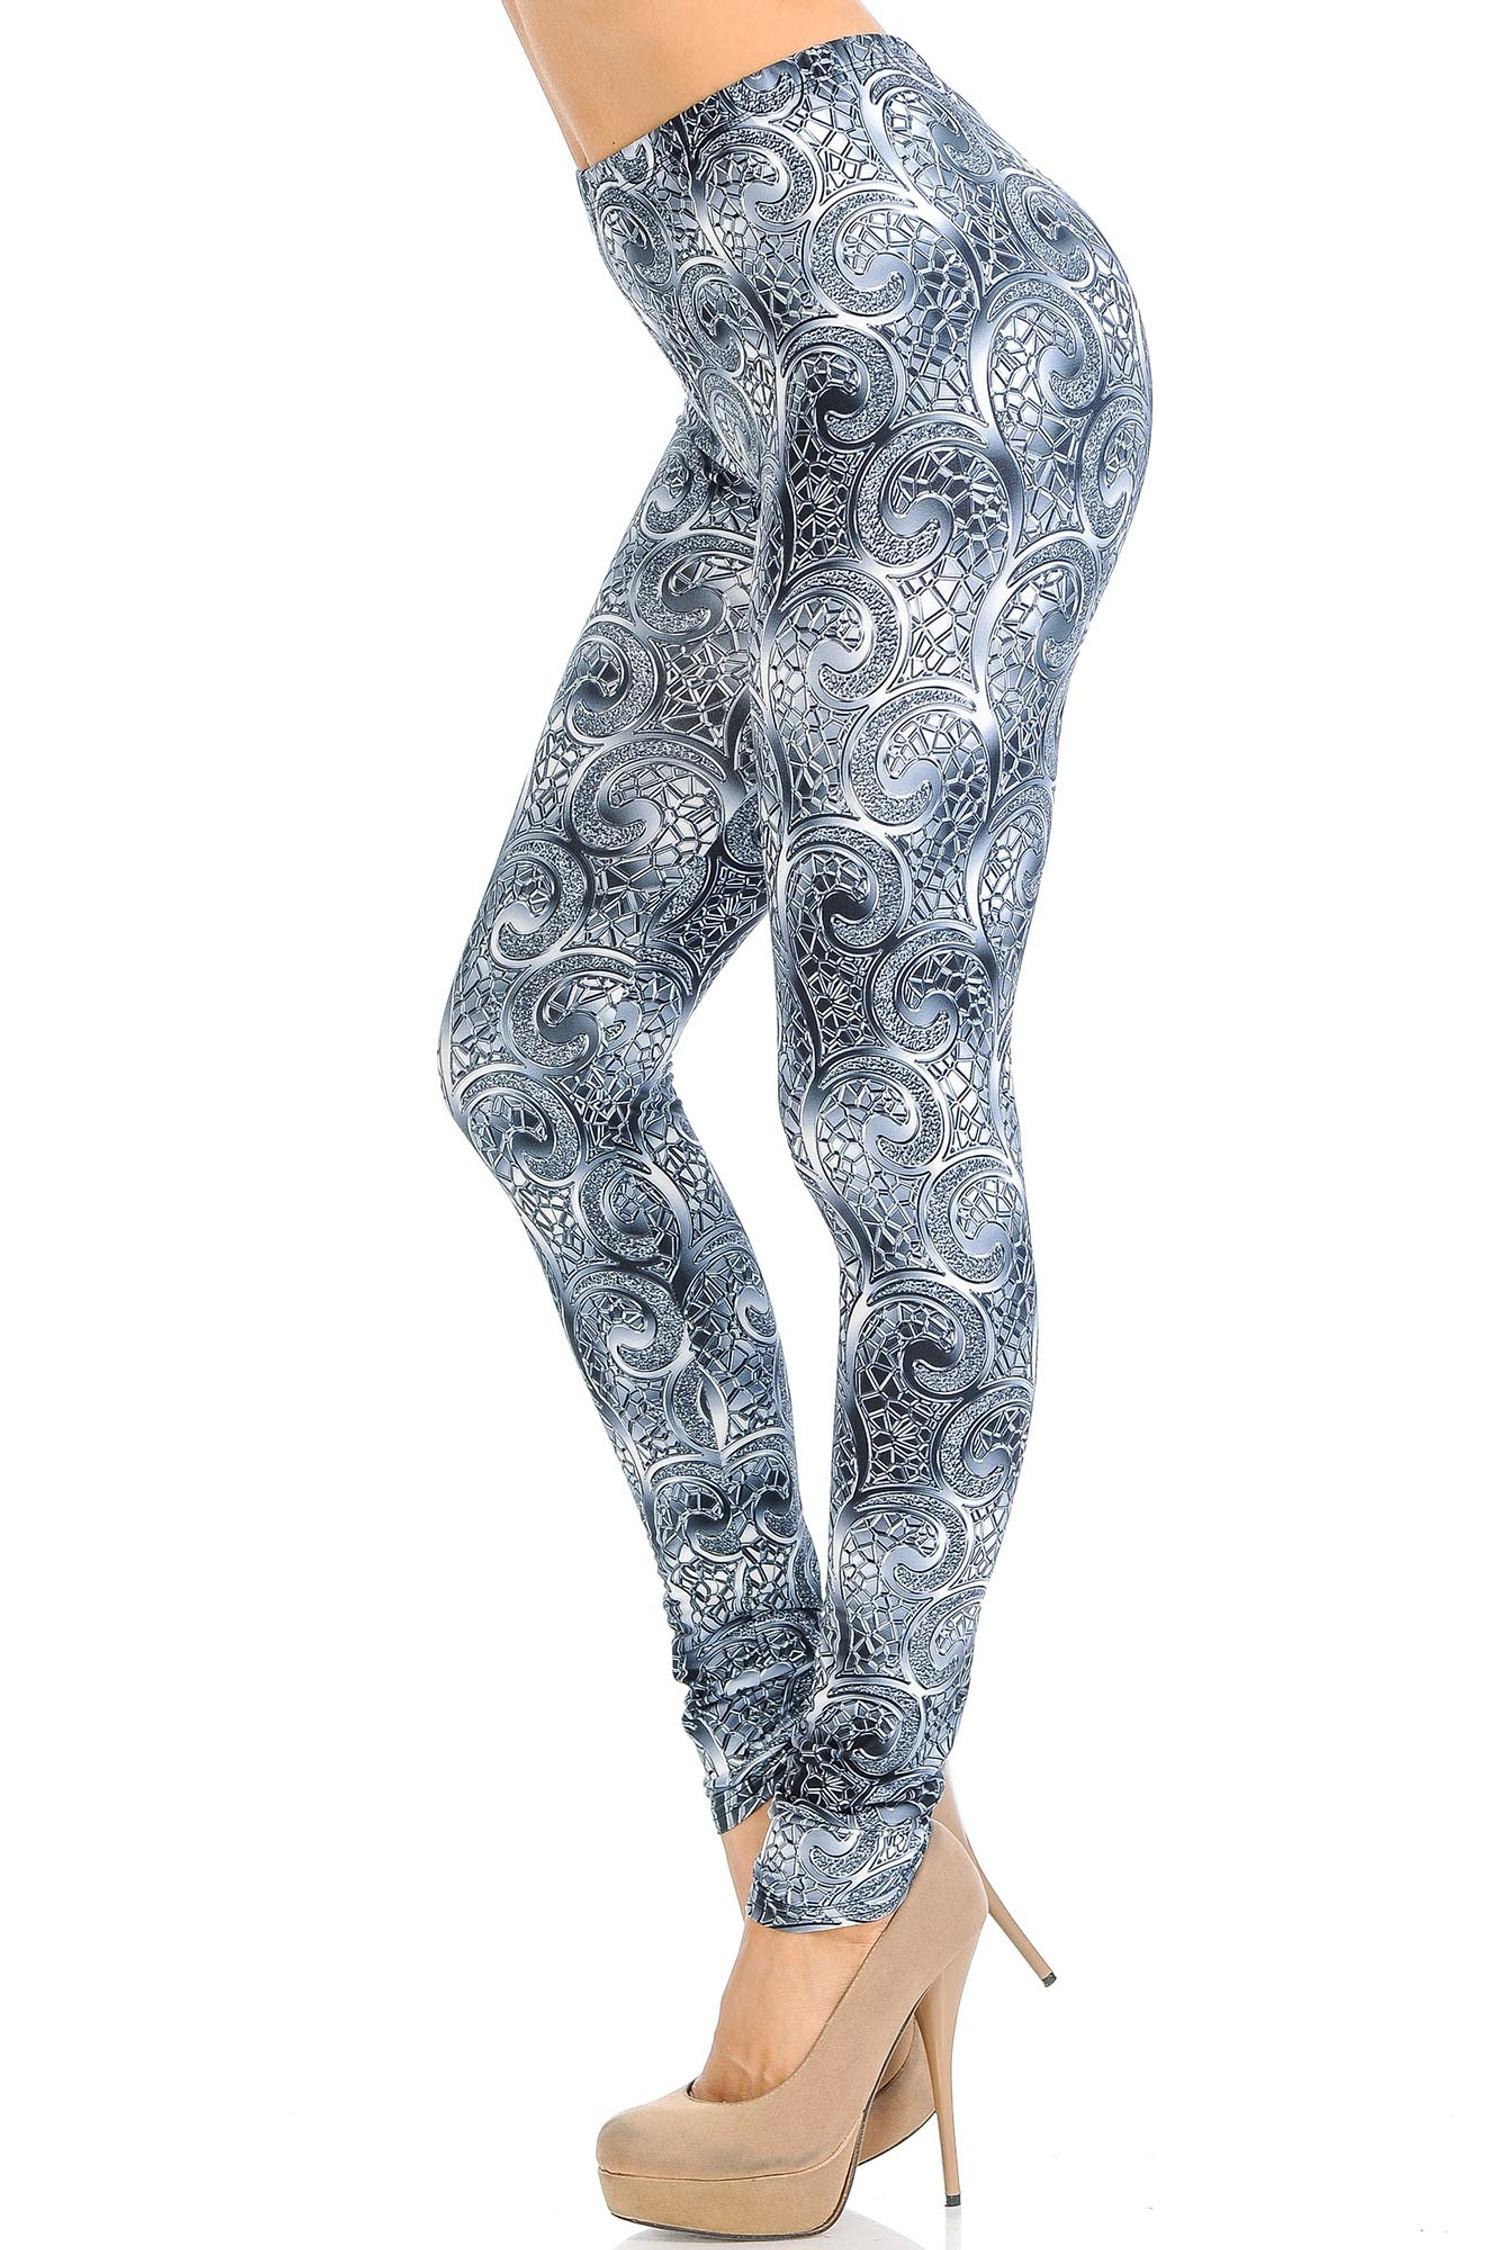 Creamy Soft Swirling Crystal Glass Leggings - USA Fashion™